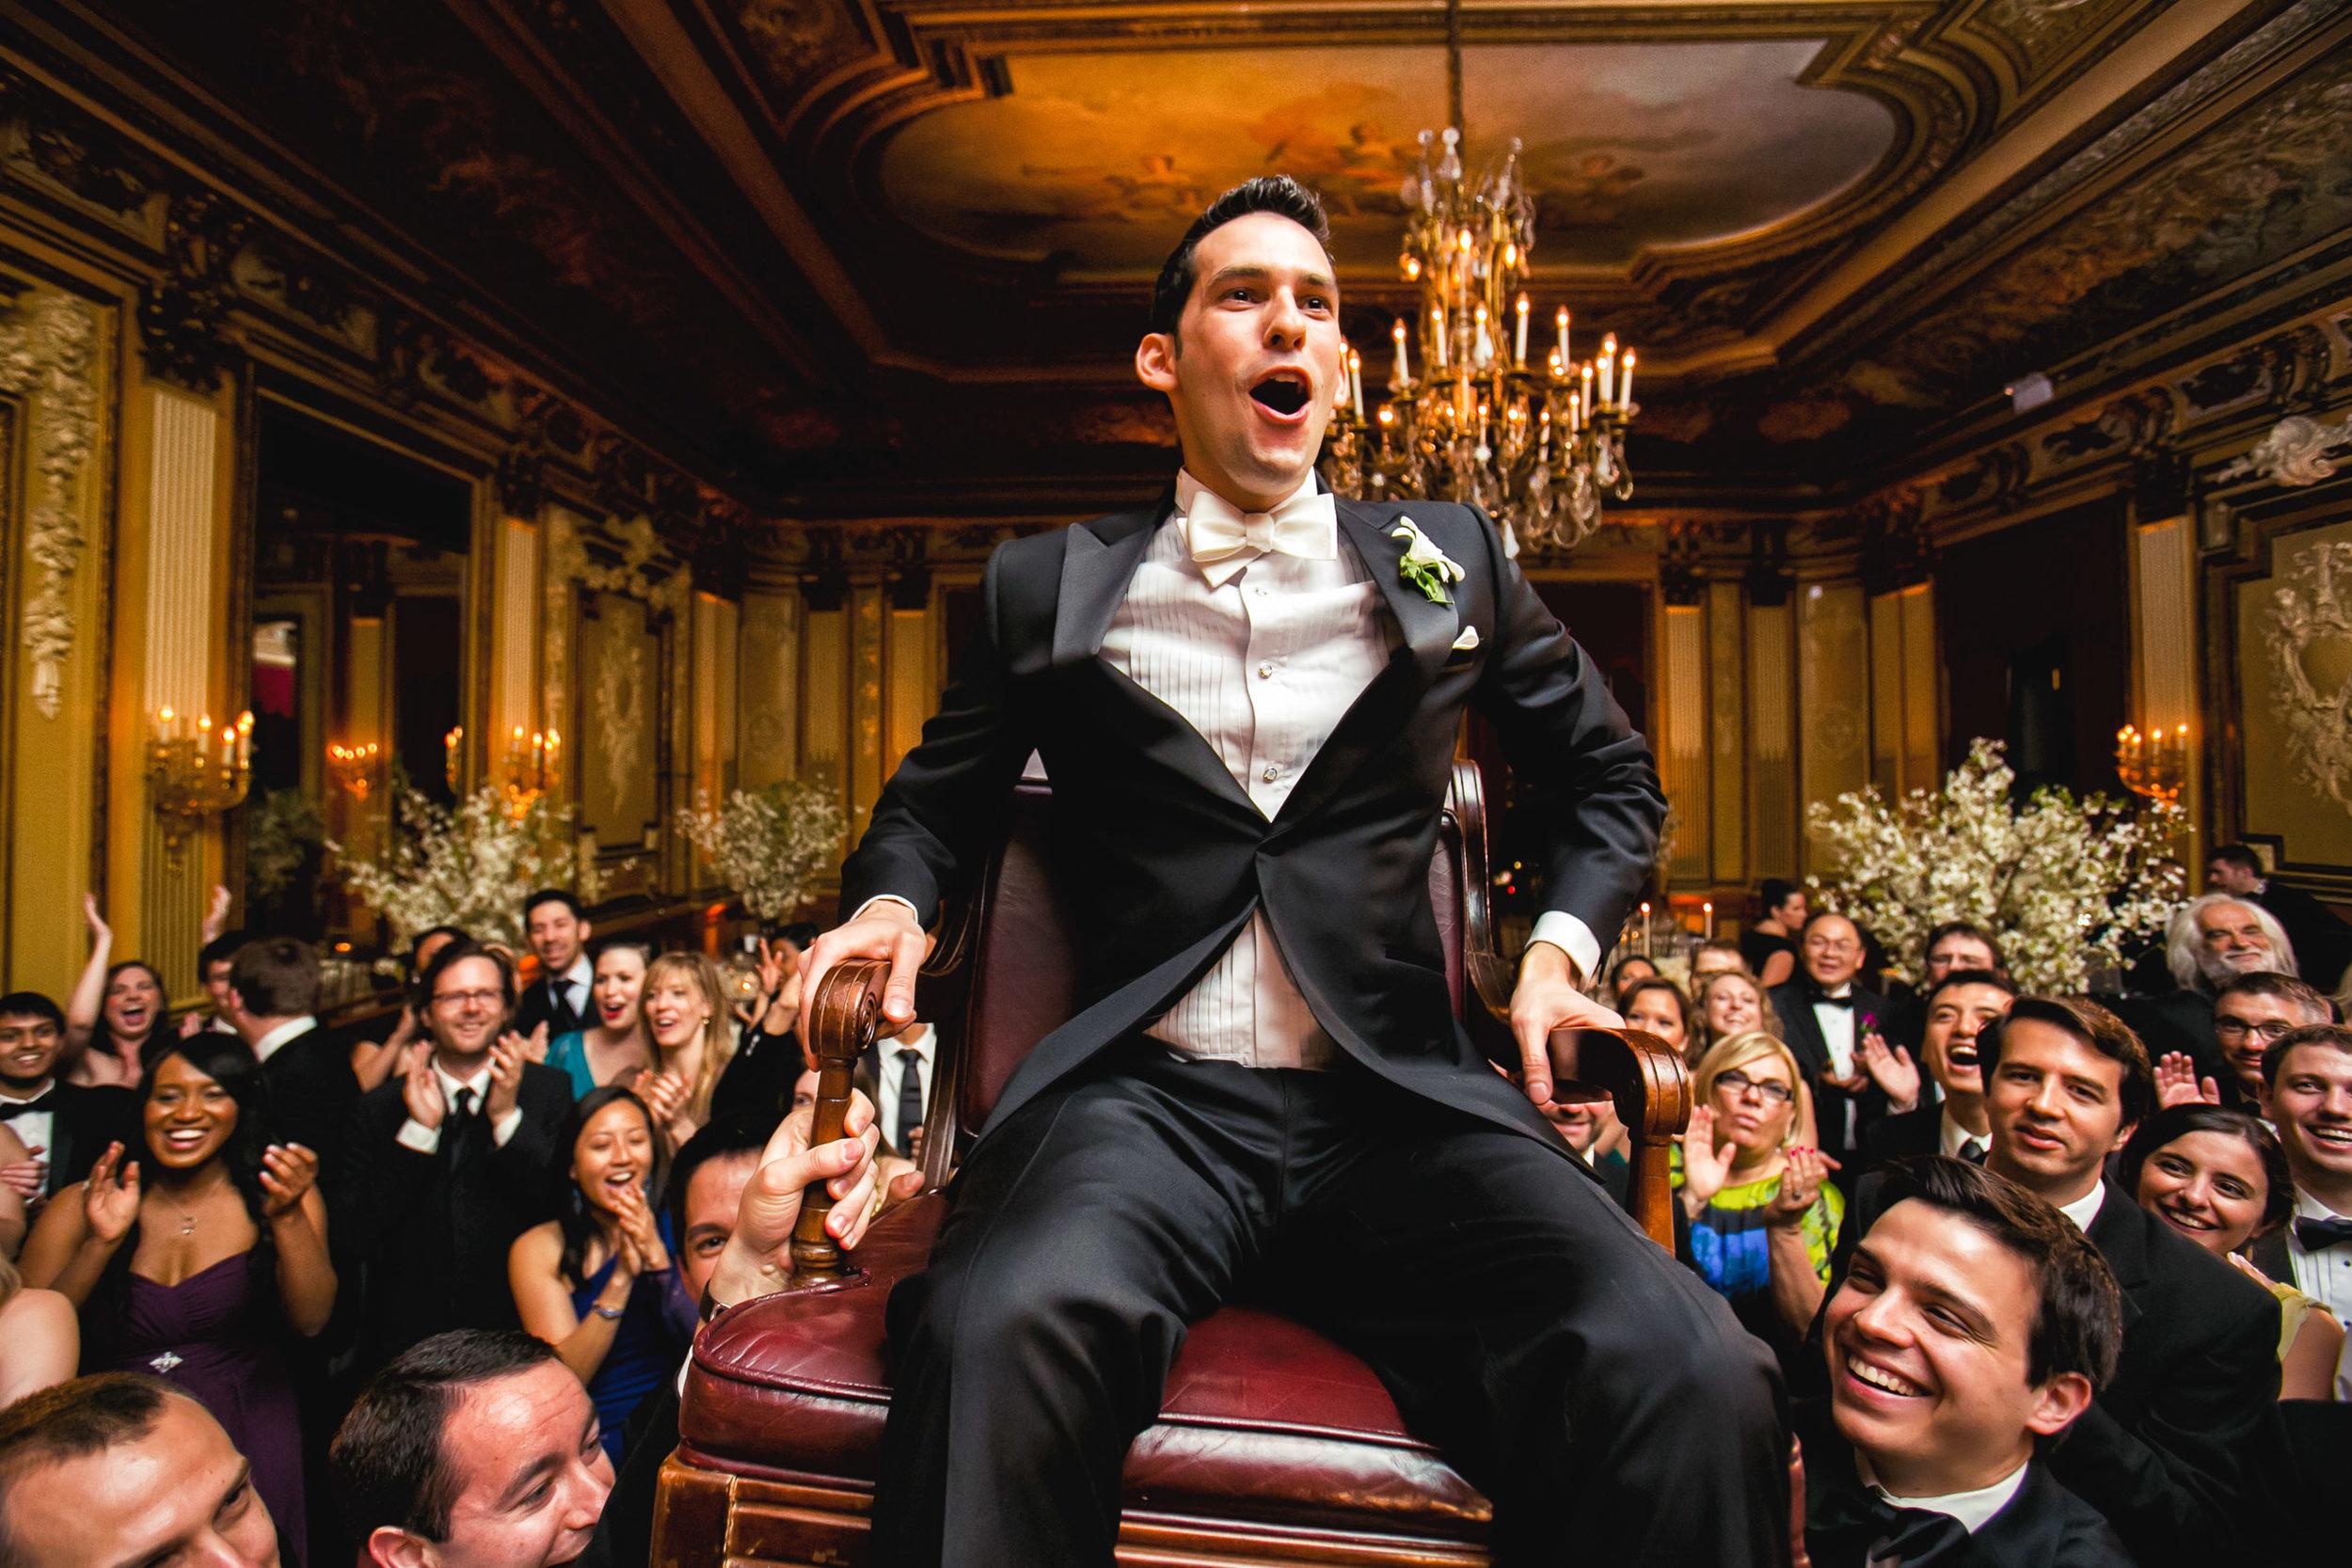 Metropolitan-Club-wedding-New-York-City.jpg